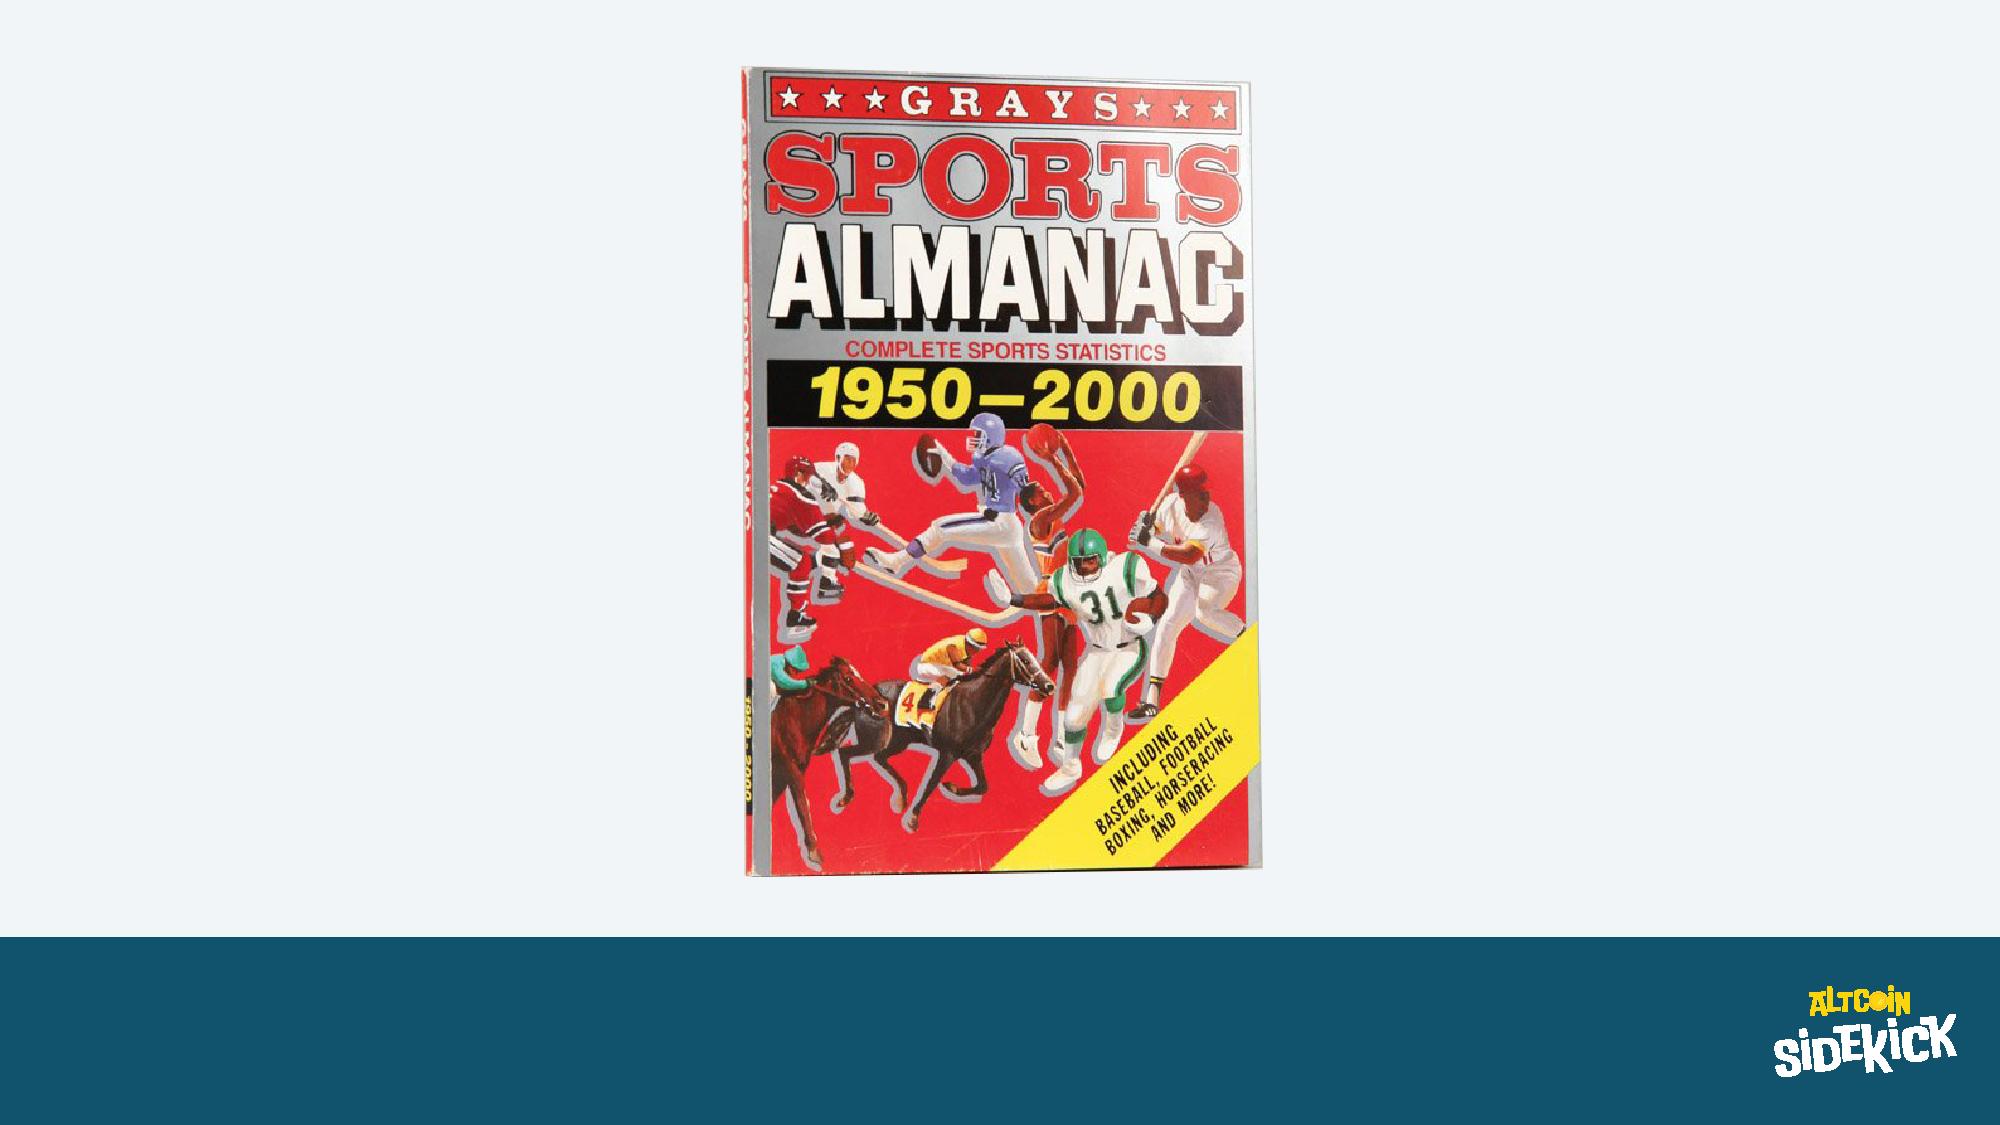 Gray's Sports Almanac